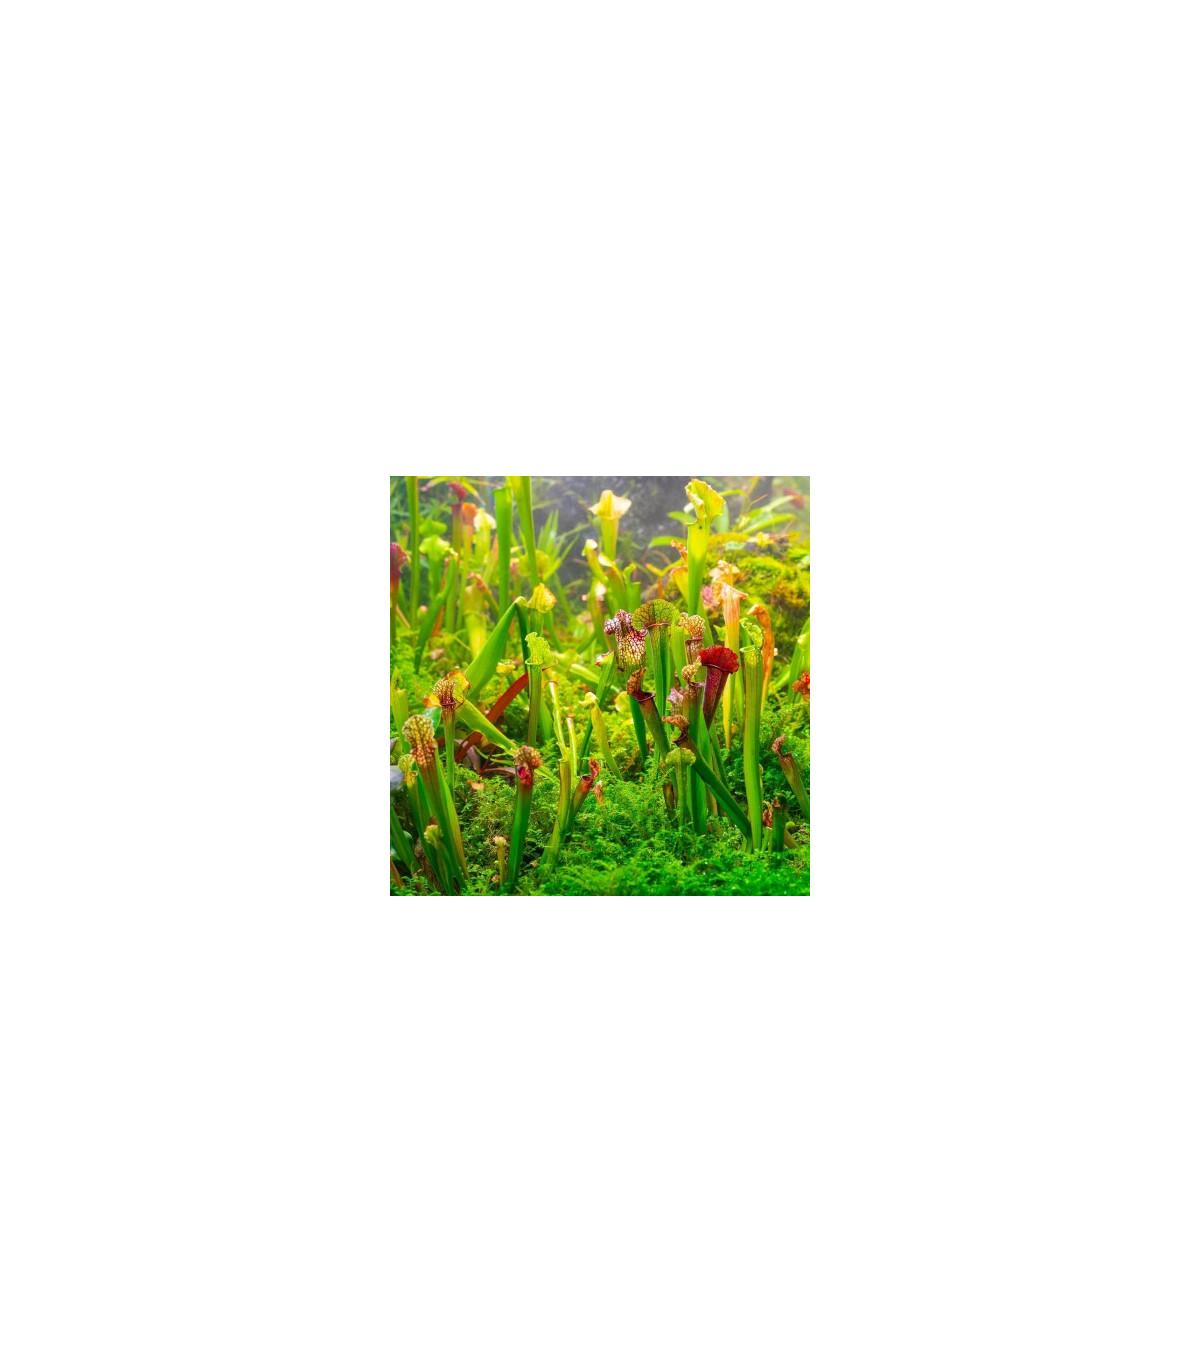 Saracénia zmes - Sarracenia mix - semená - 12 ks